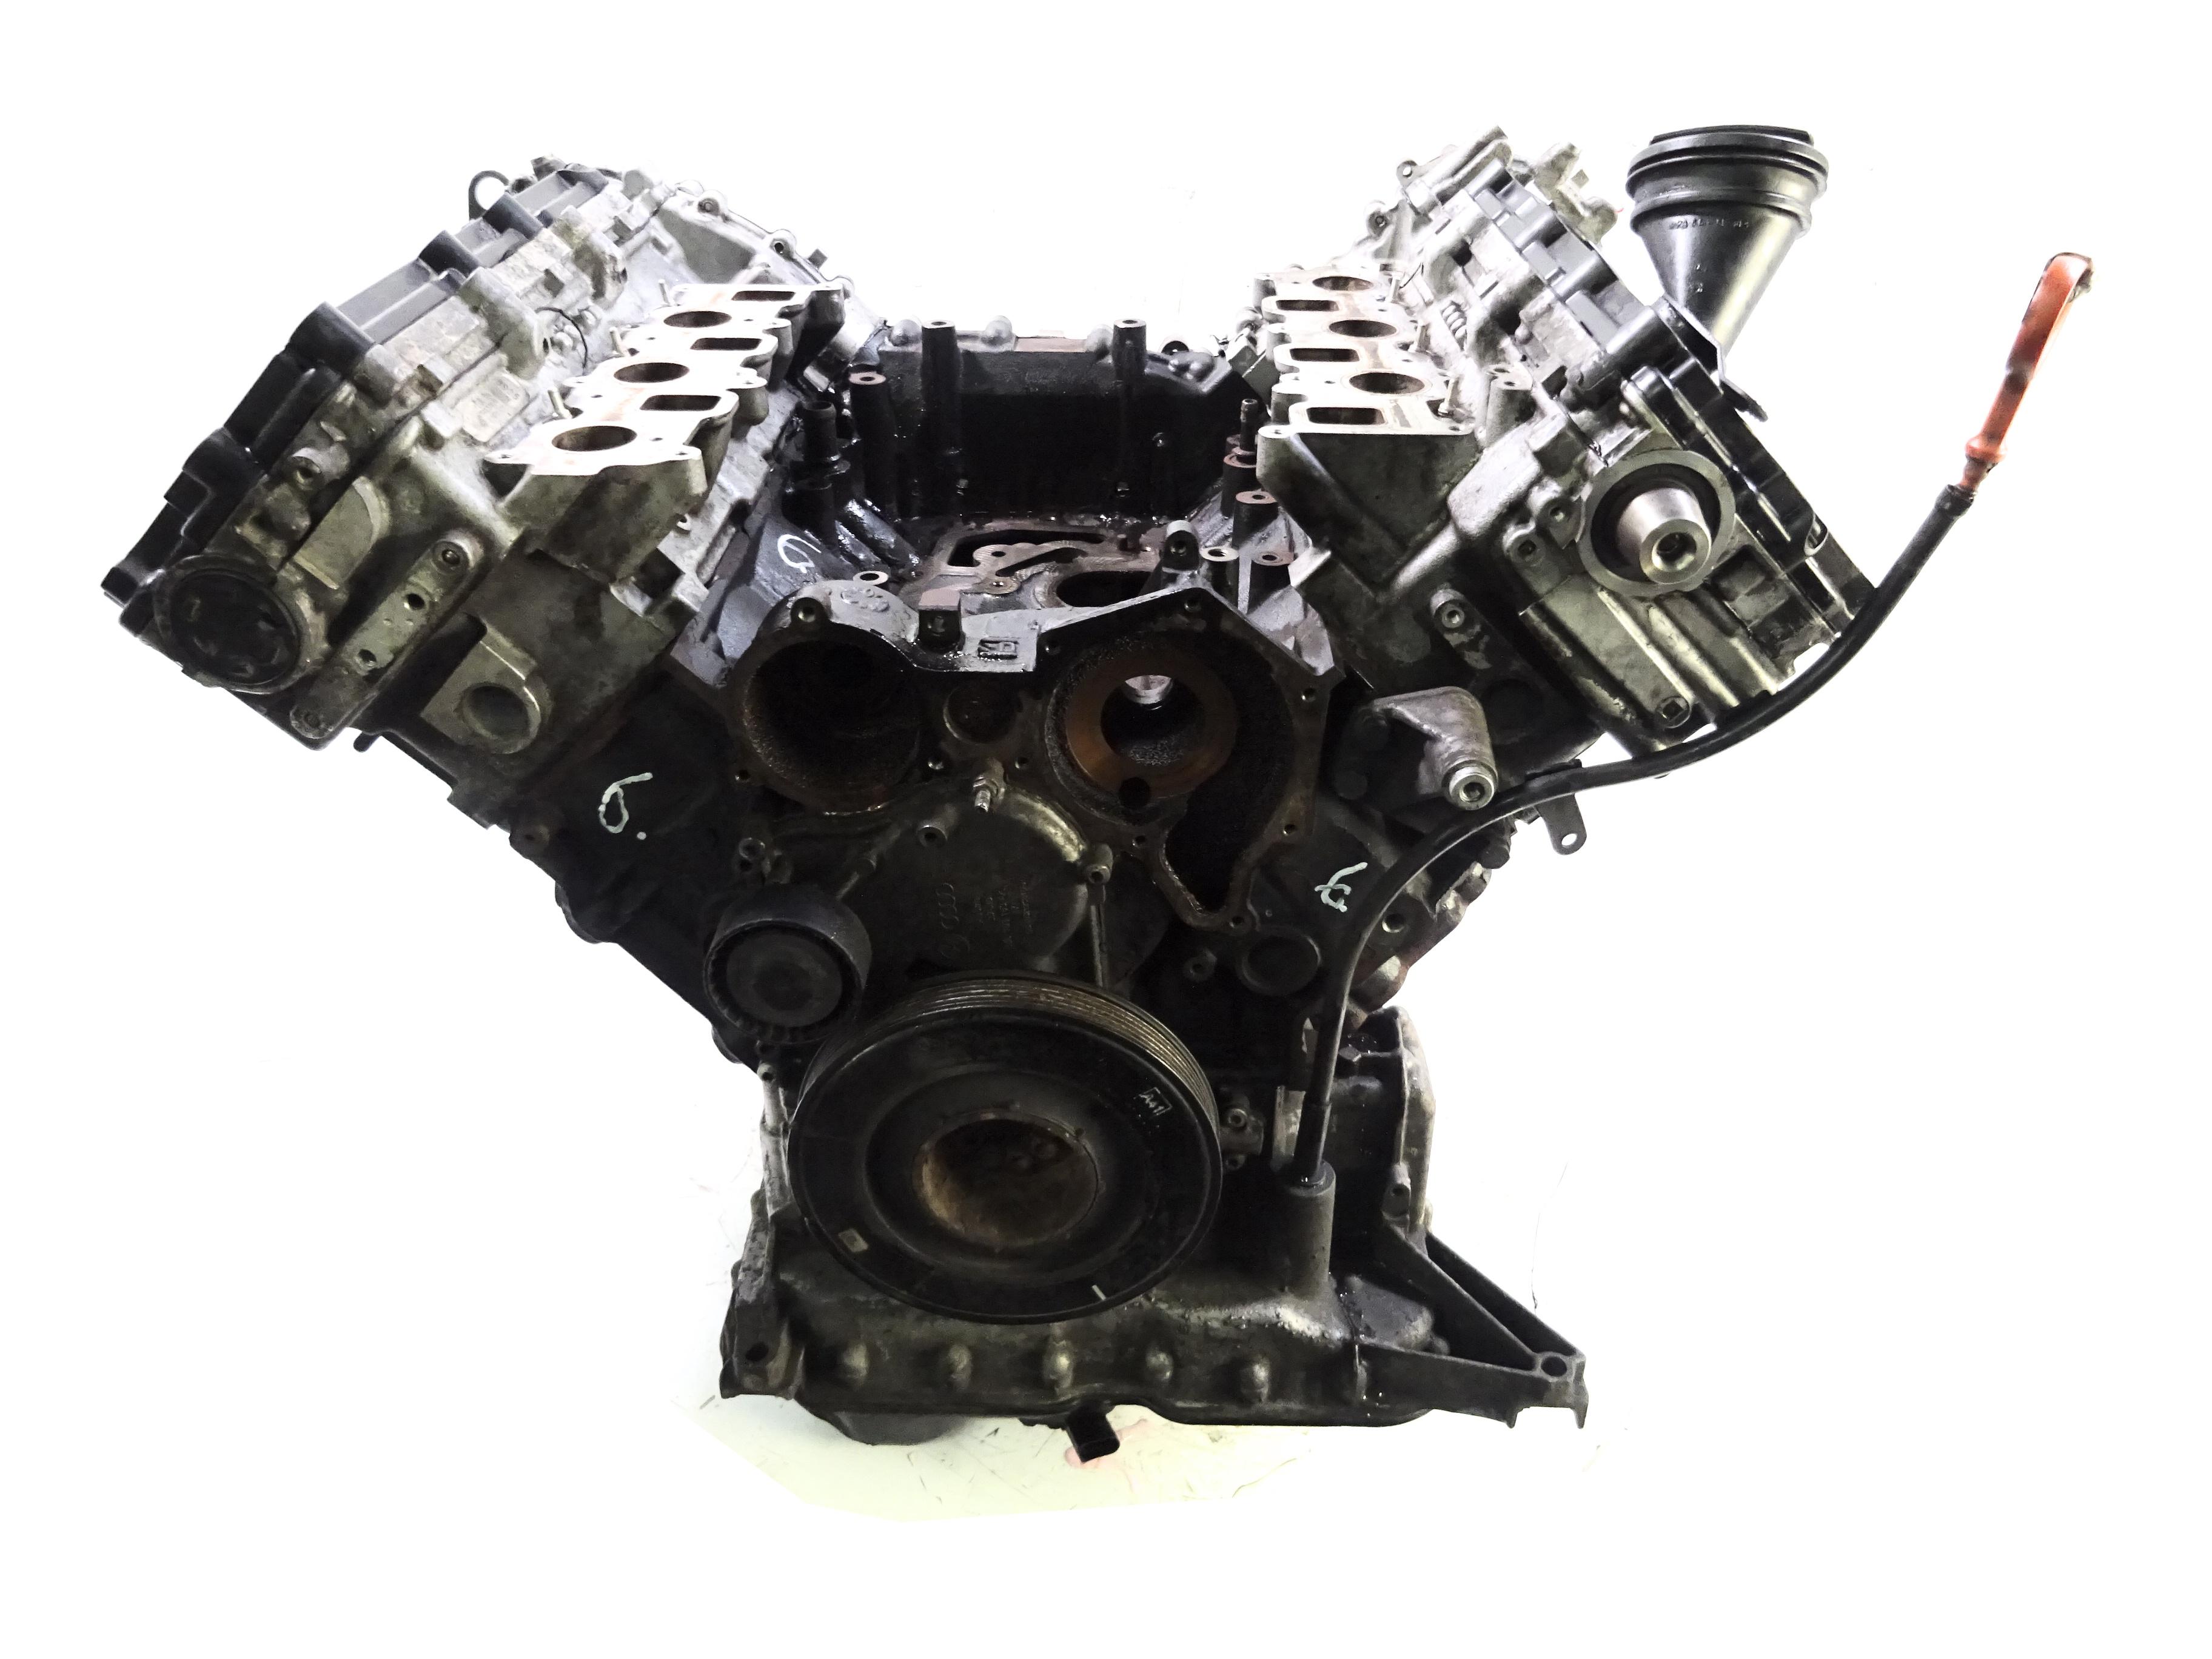 Motor für Audi VW Q7 4L Touareg 7P 7L 3,0 TDI Diesel CAS CASA CASB CASC